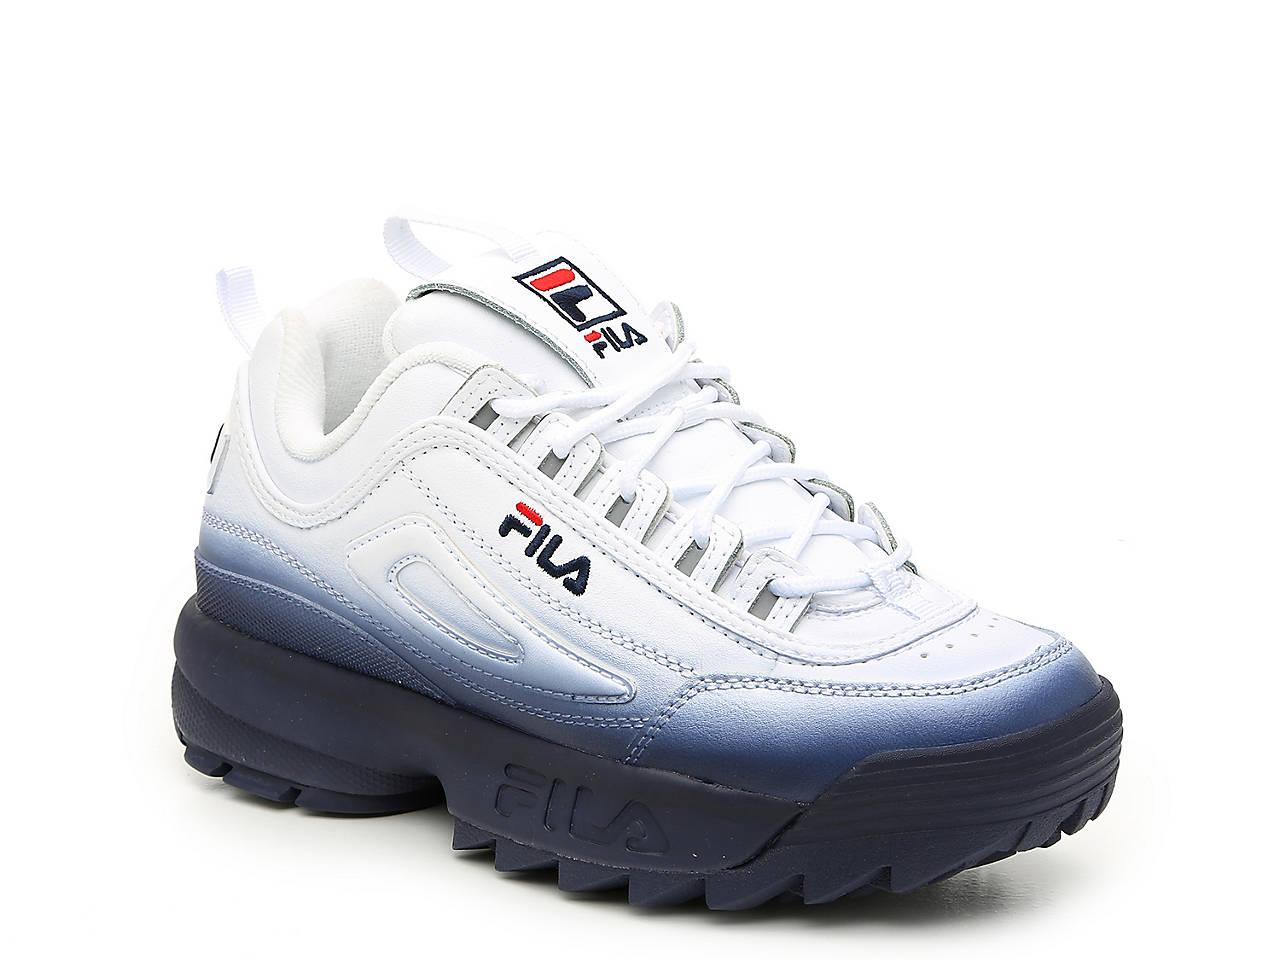 2fd52c76a100 Fila Disruptor II Fade Sneaker - Women s Women s Shoes